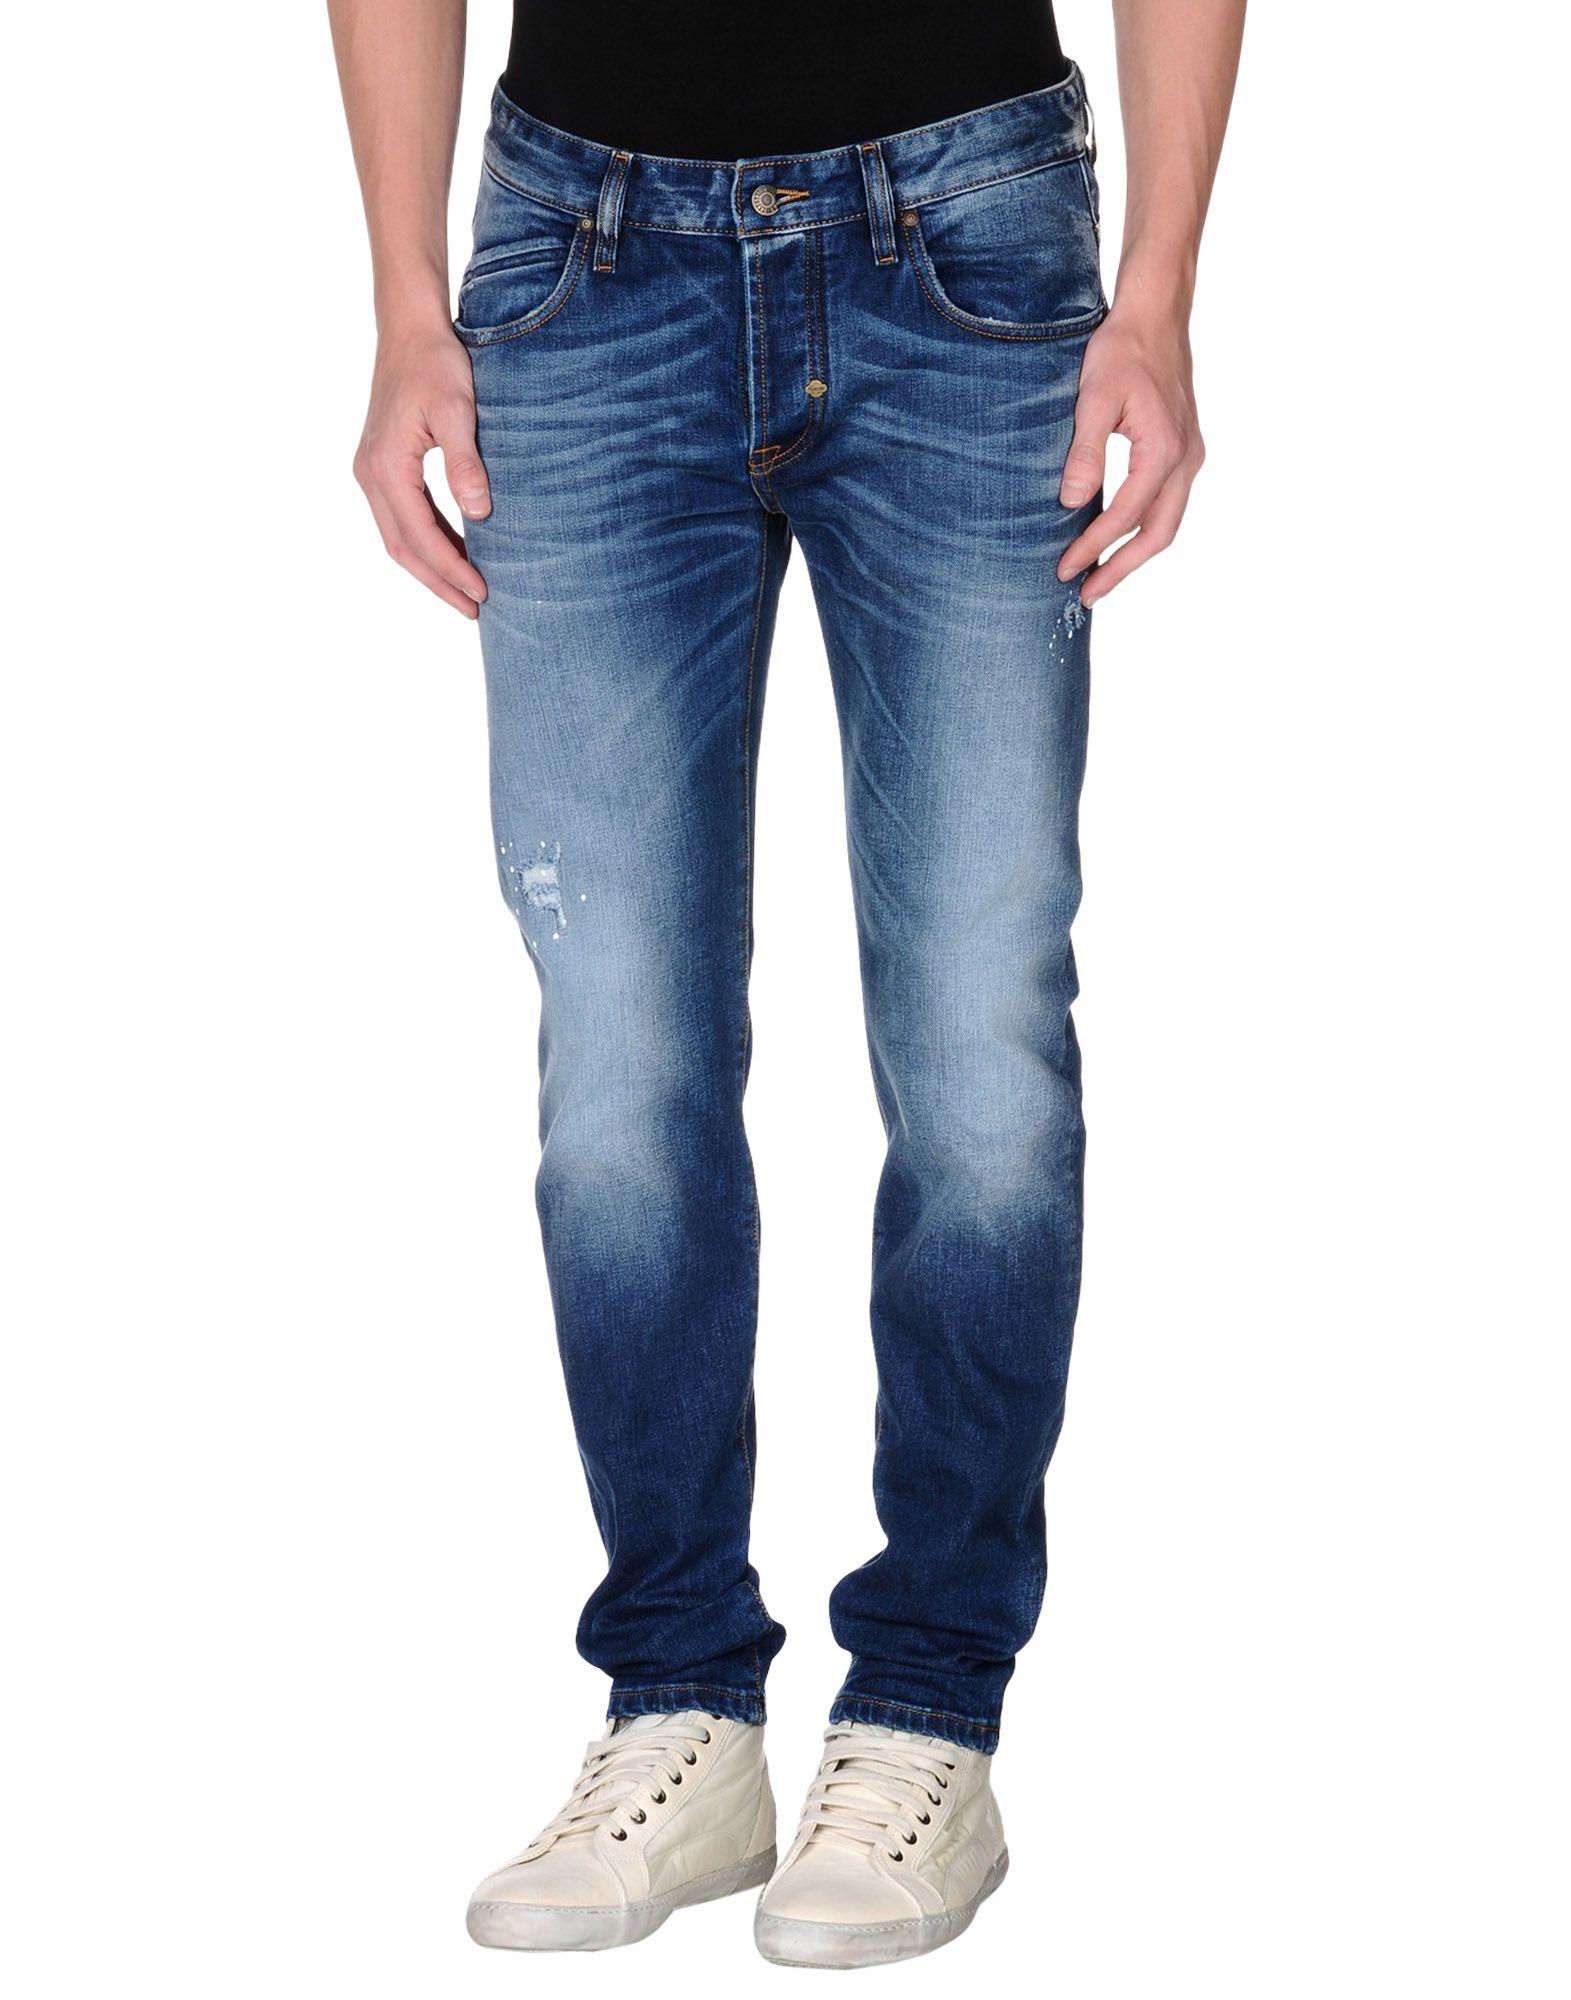 Takeshy kurosawa Denim Trousers in Blue for Men